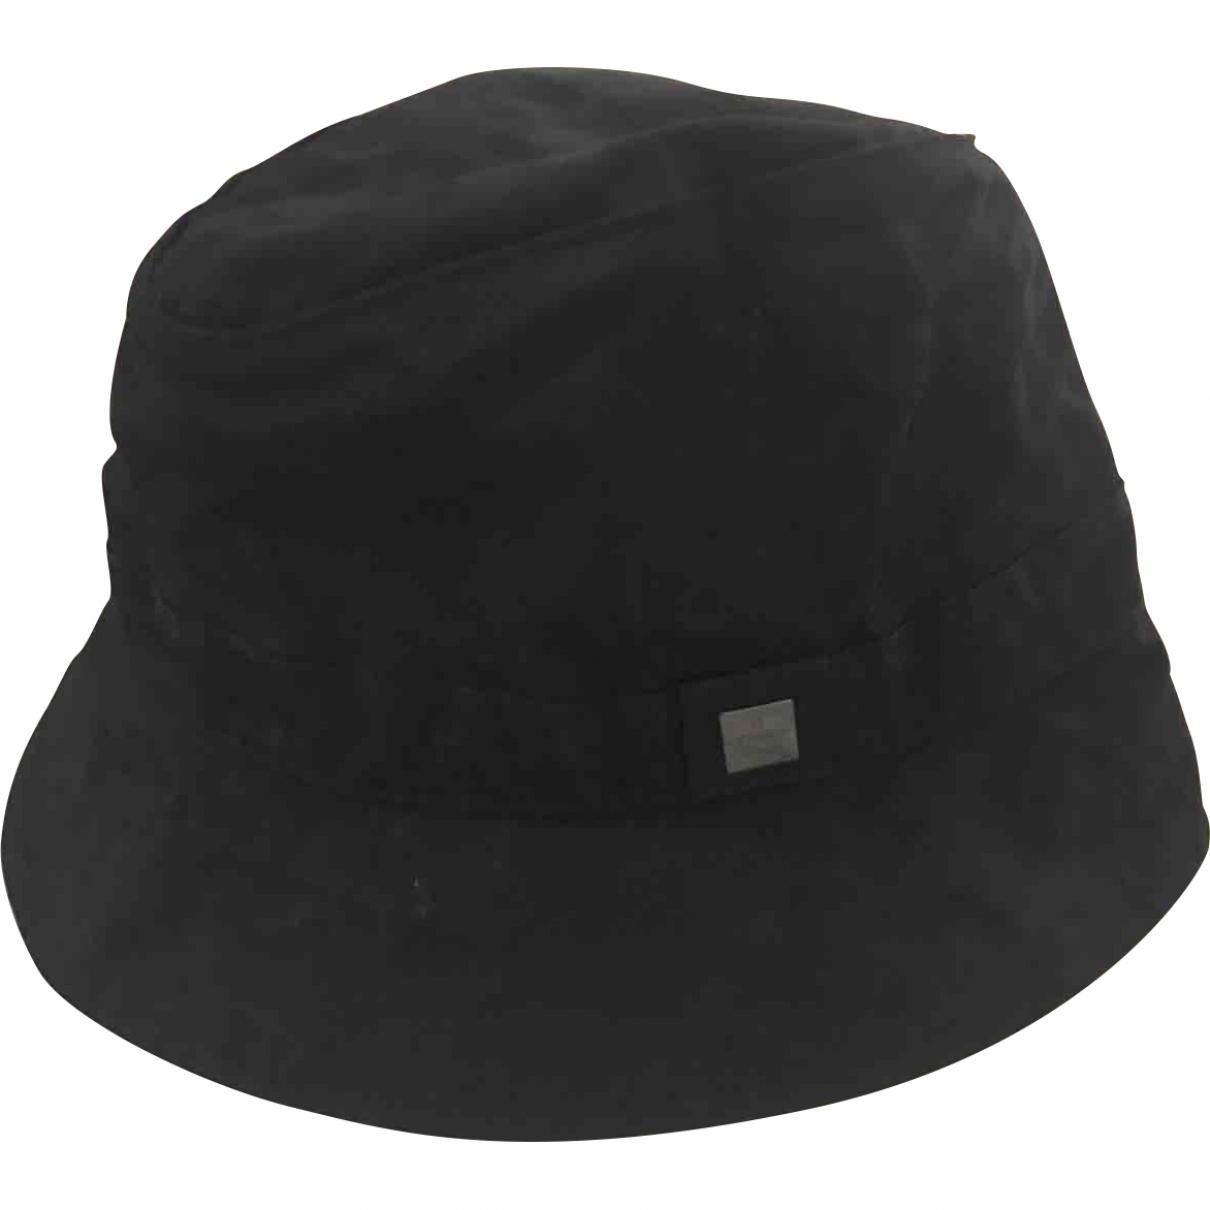 bb80b665793 Lyst - Fendi Pre-owned Black Cloth Hats in Black